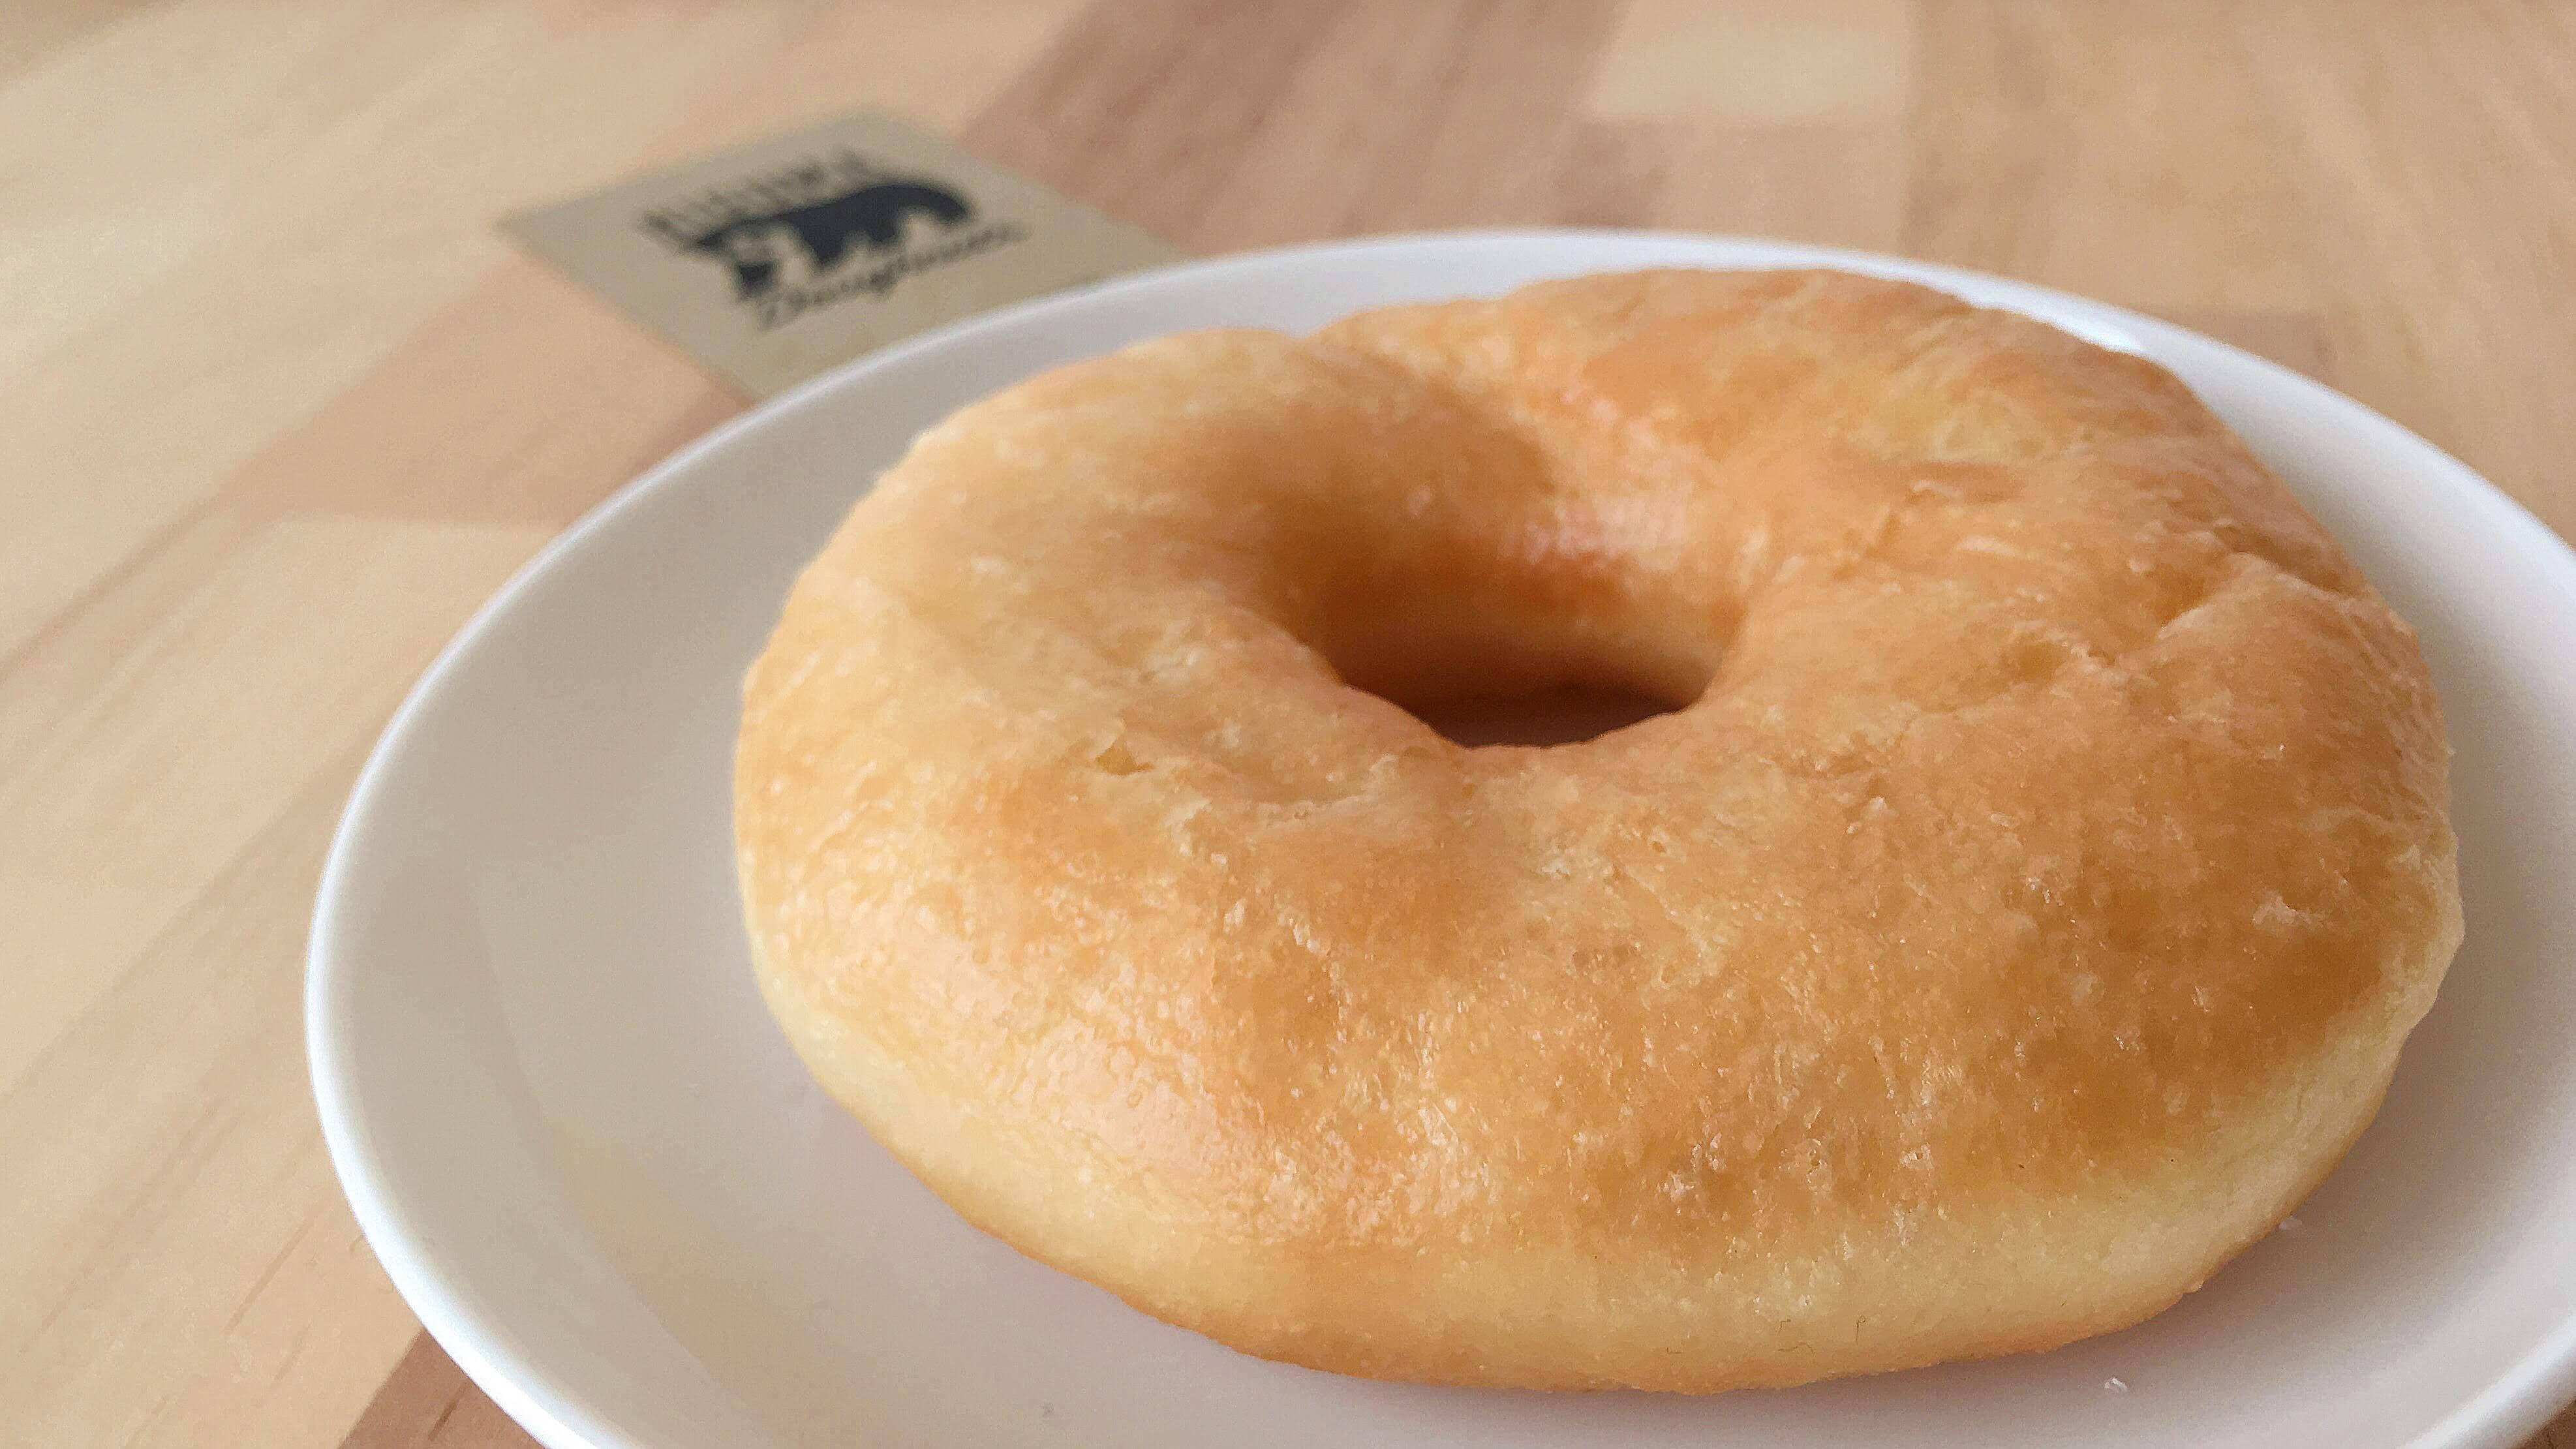 HIGUMA Doughnuts(ヒグマドーナッツ)のプレーンドーナツのアップ